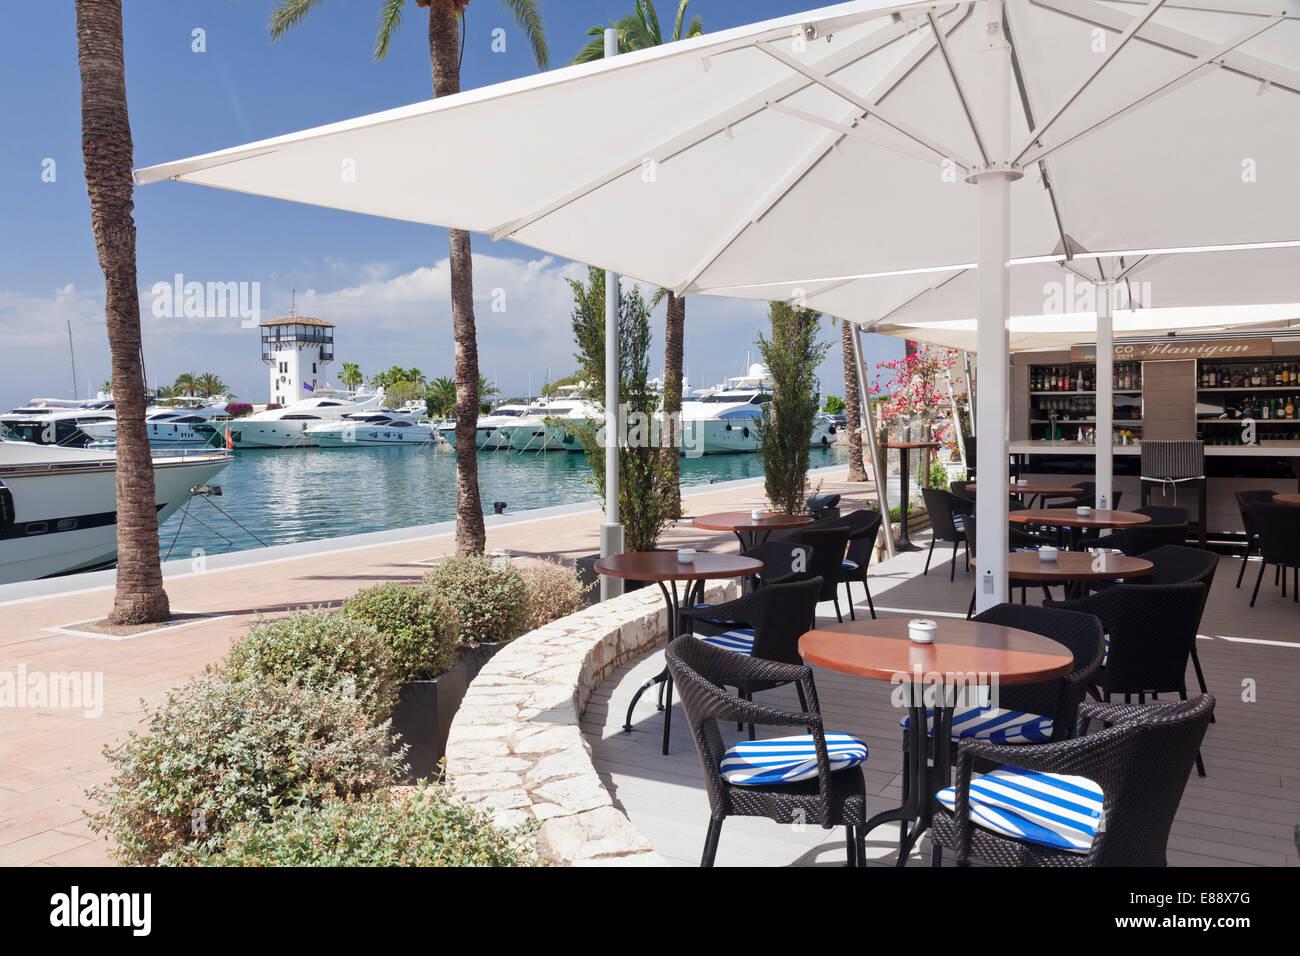 Cafe at promenade at marina, Portals Nous, Majorca, Balearic Islands, Spain, Mediterranean, Europe - Stock Image